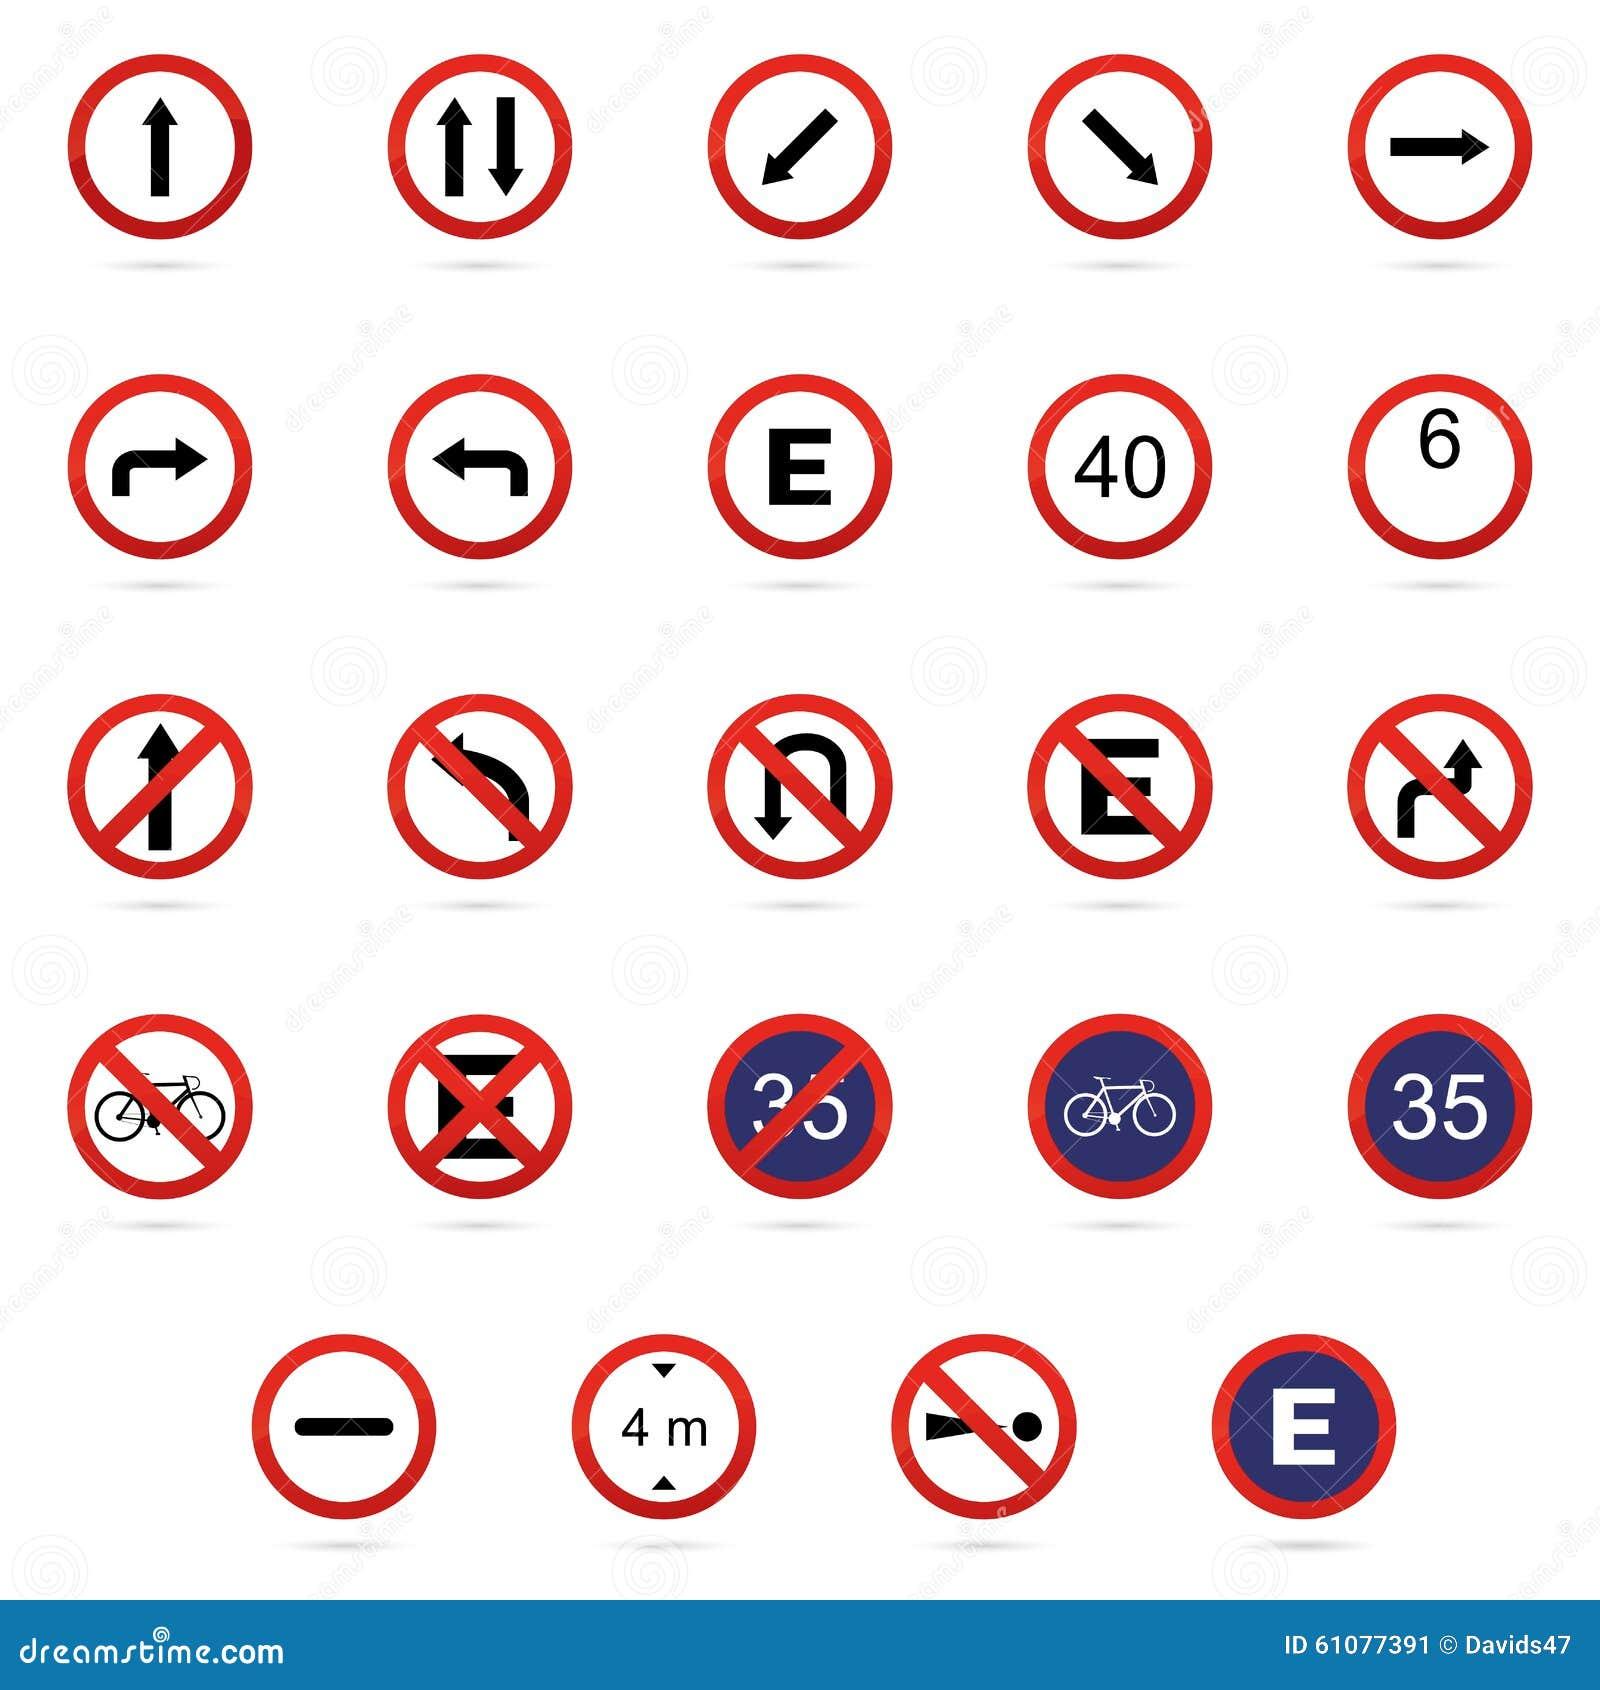 Transit Signals Stock Vector Illustration Of Text Arrow